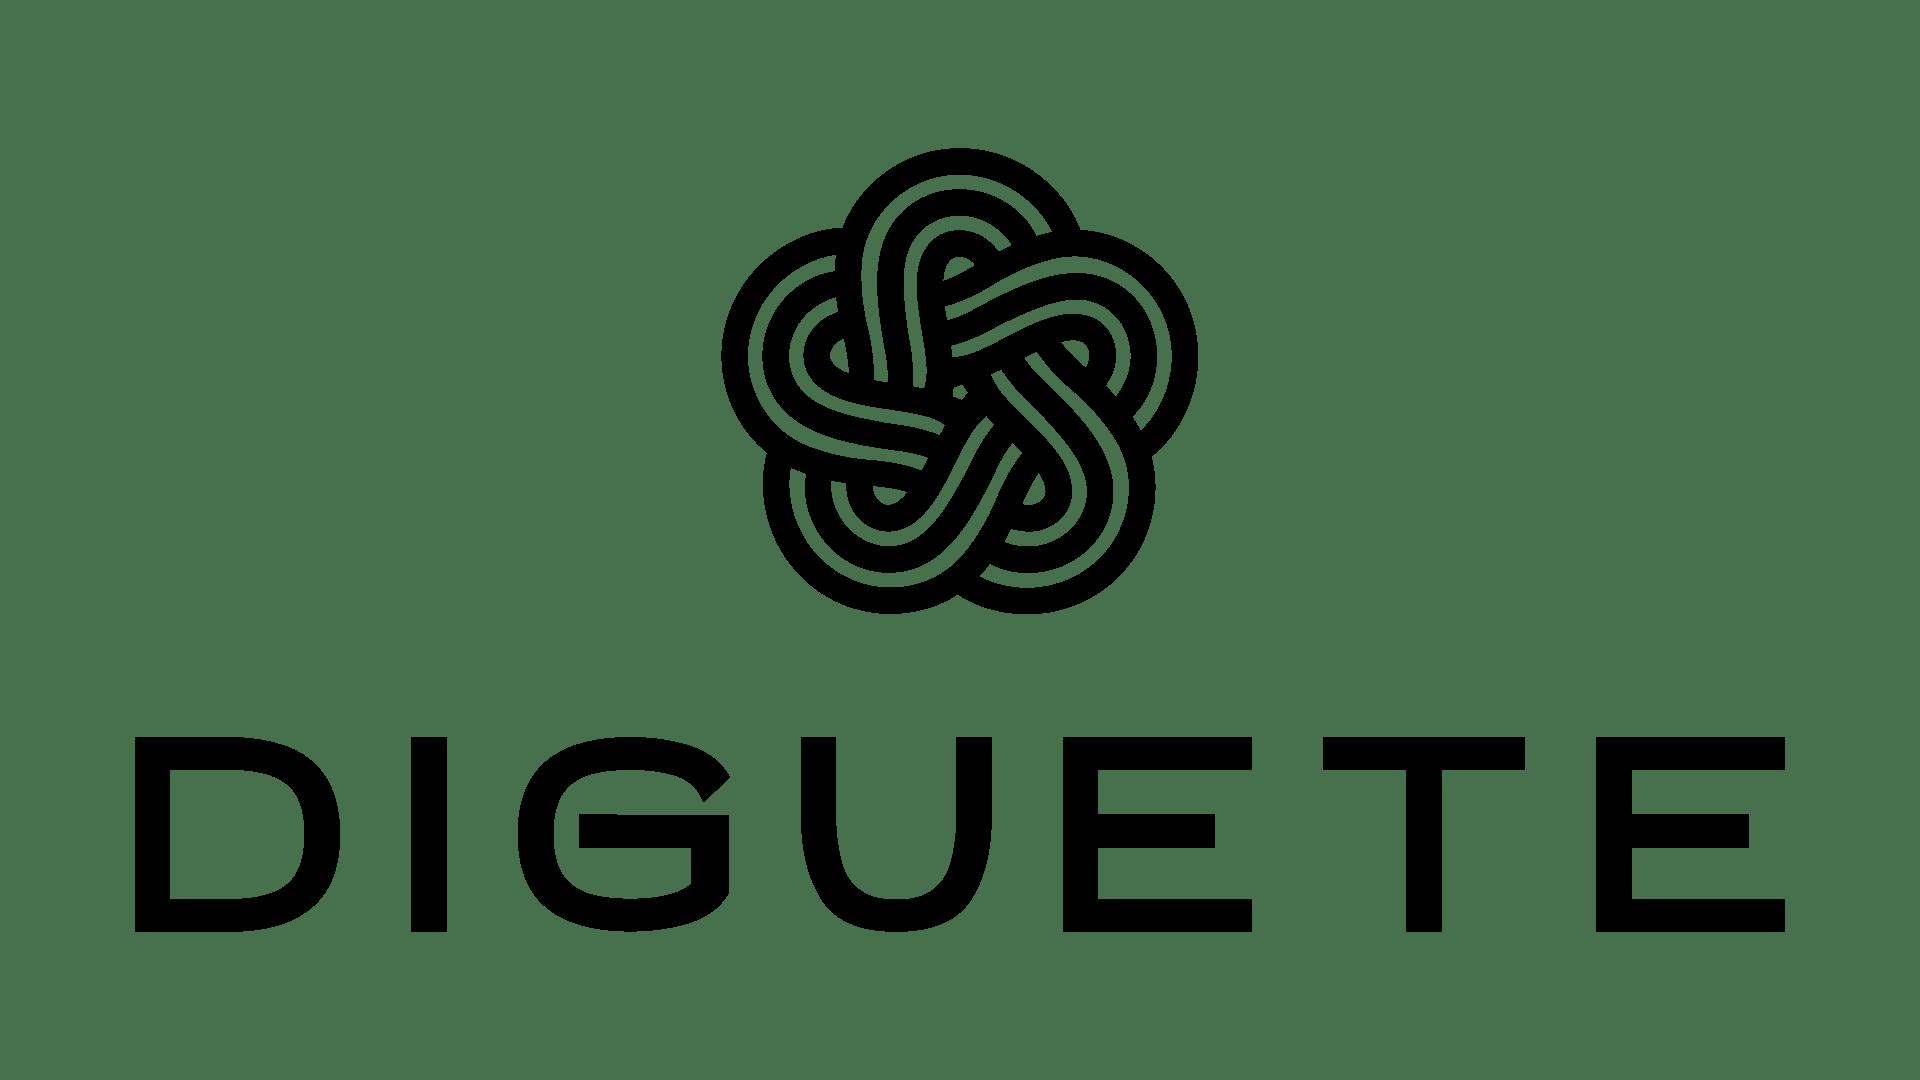 Diguete Tricot : Brand Short Description Type Here.